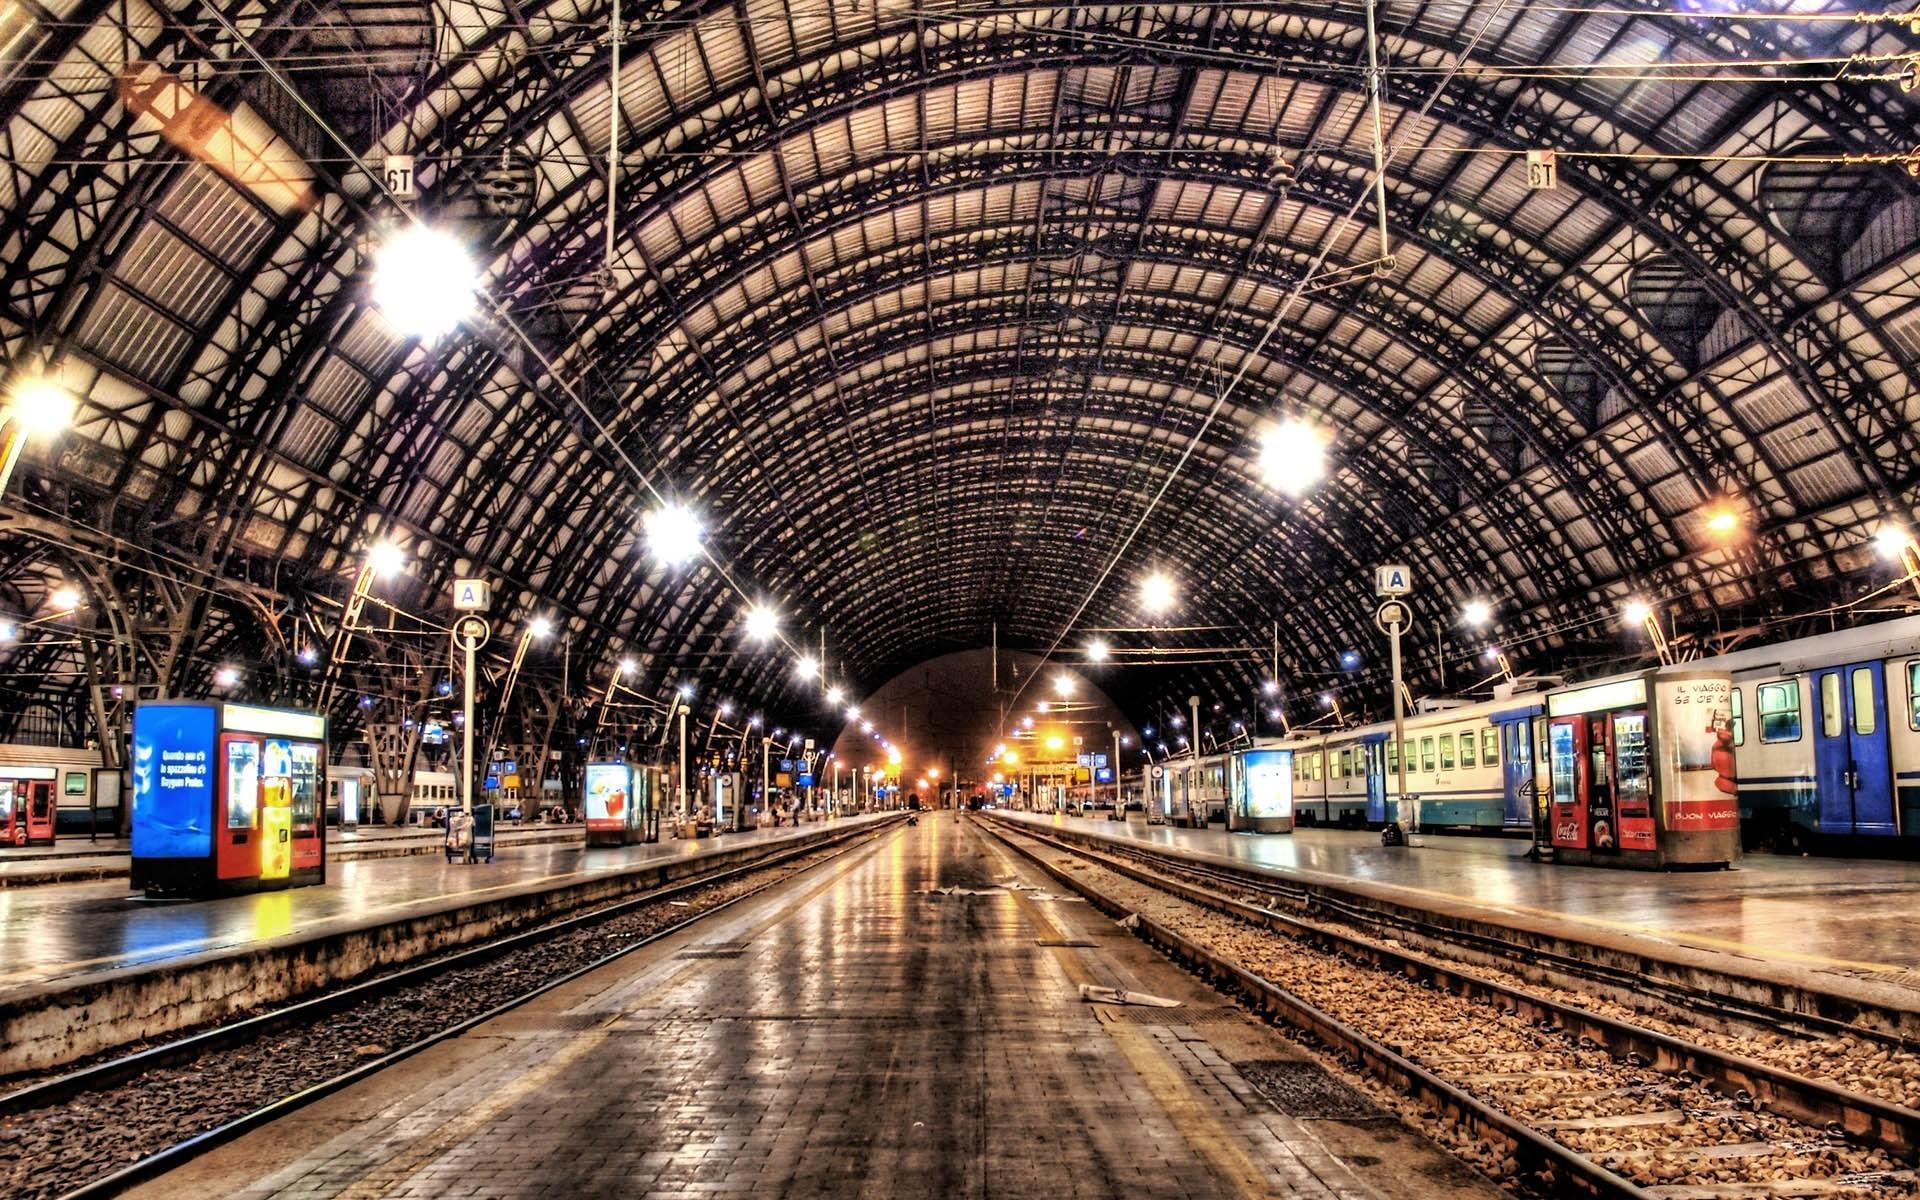 Train Station Wallpaper Pictures 49179 1920x1200 px ~ HDWallSource.com